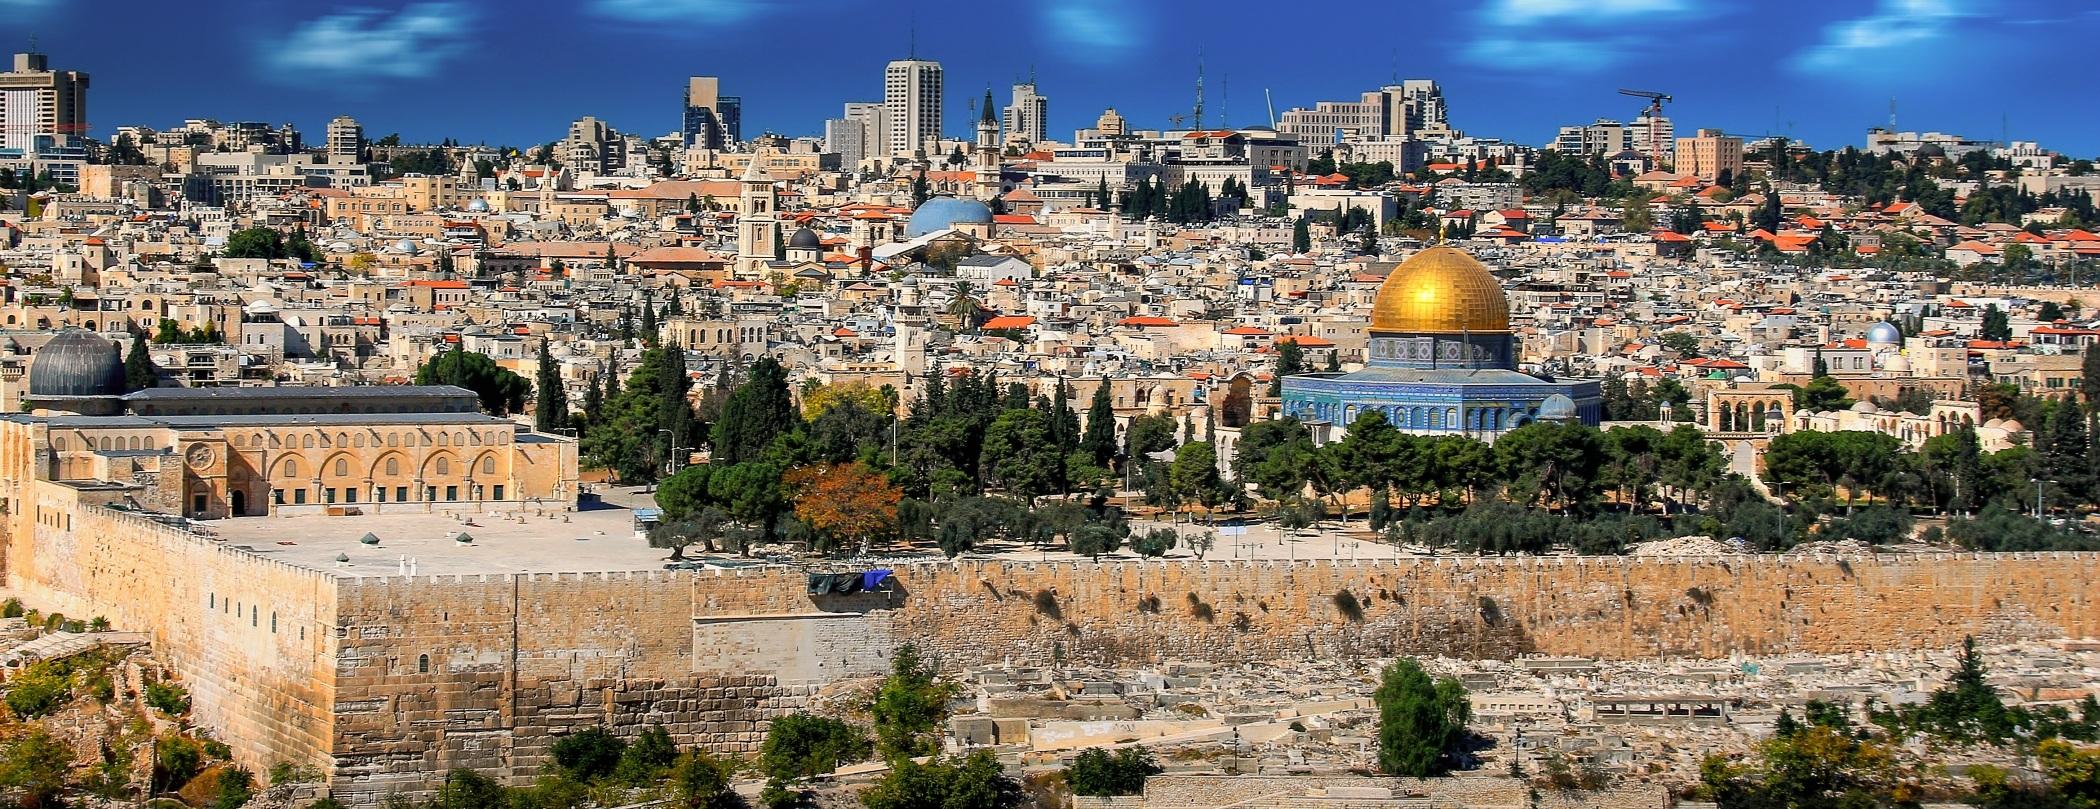 jerusalem-1712855.jpg